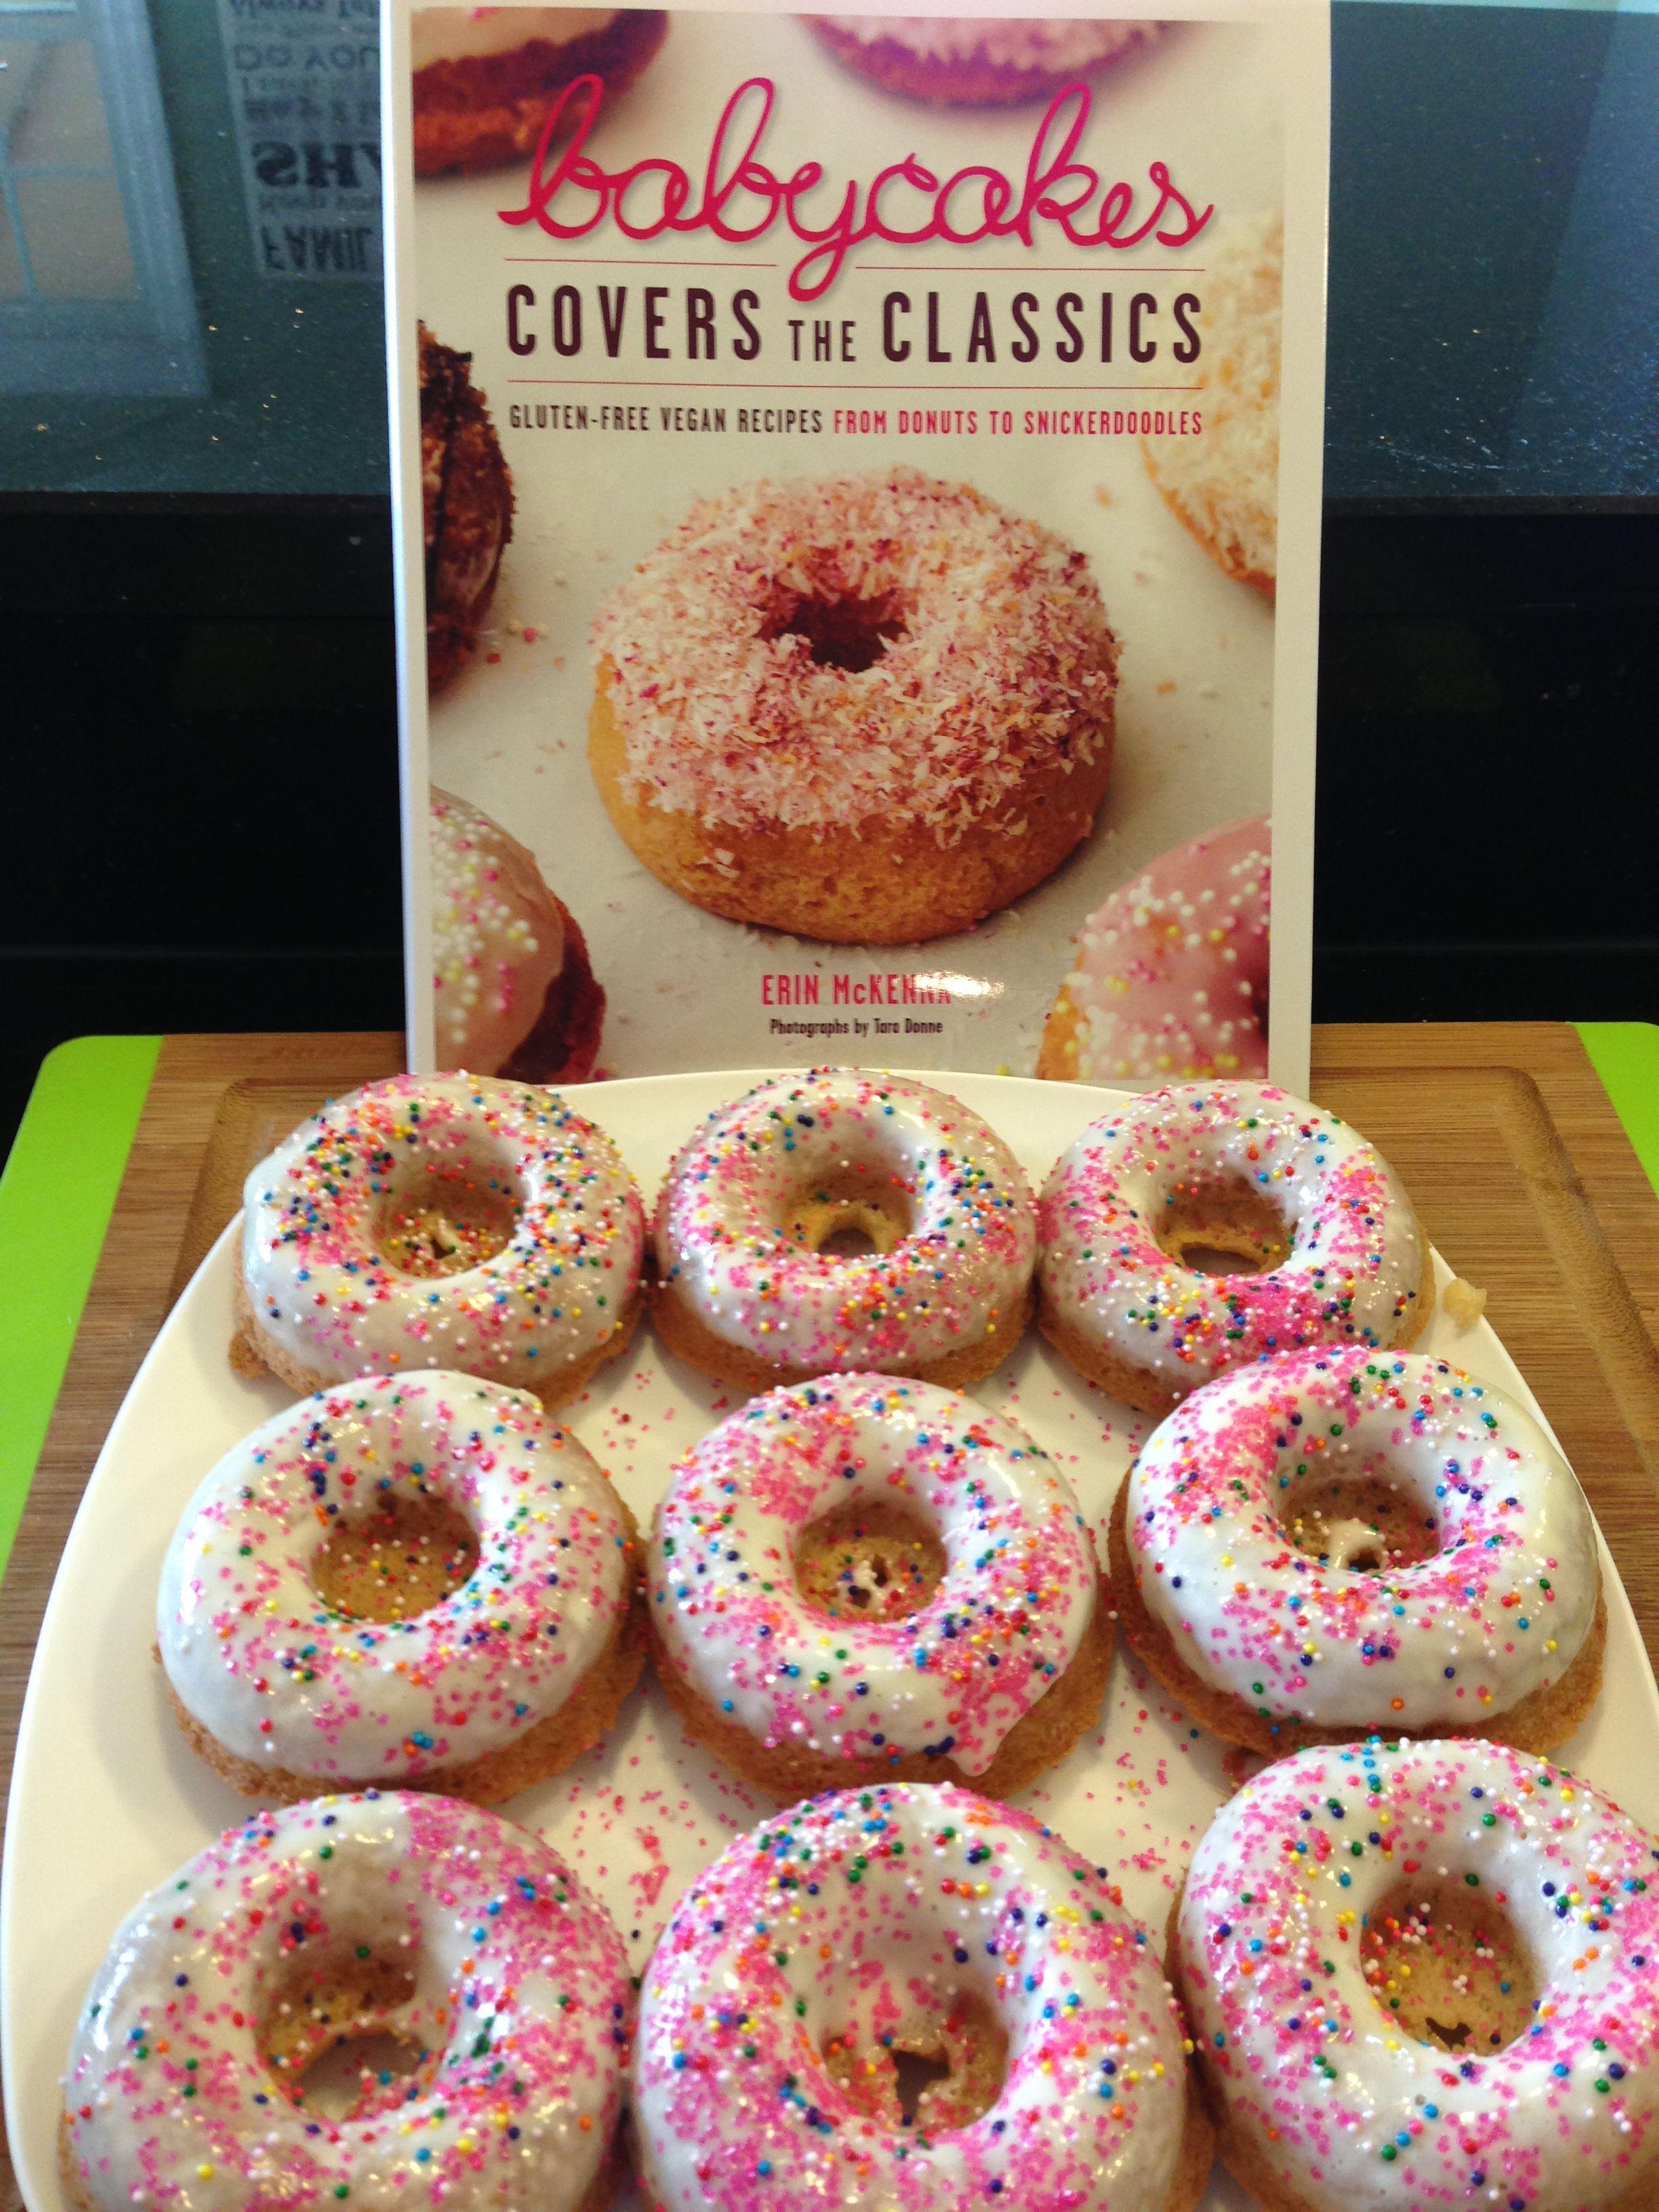 Best donuts everbabycakes nyc recipe babycakes donut